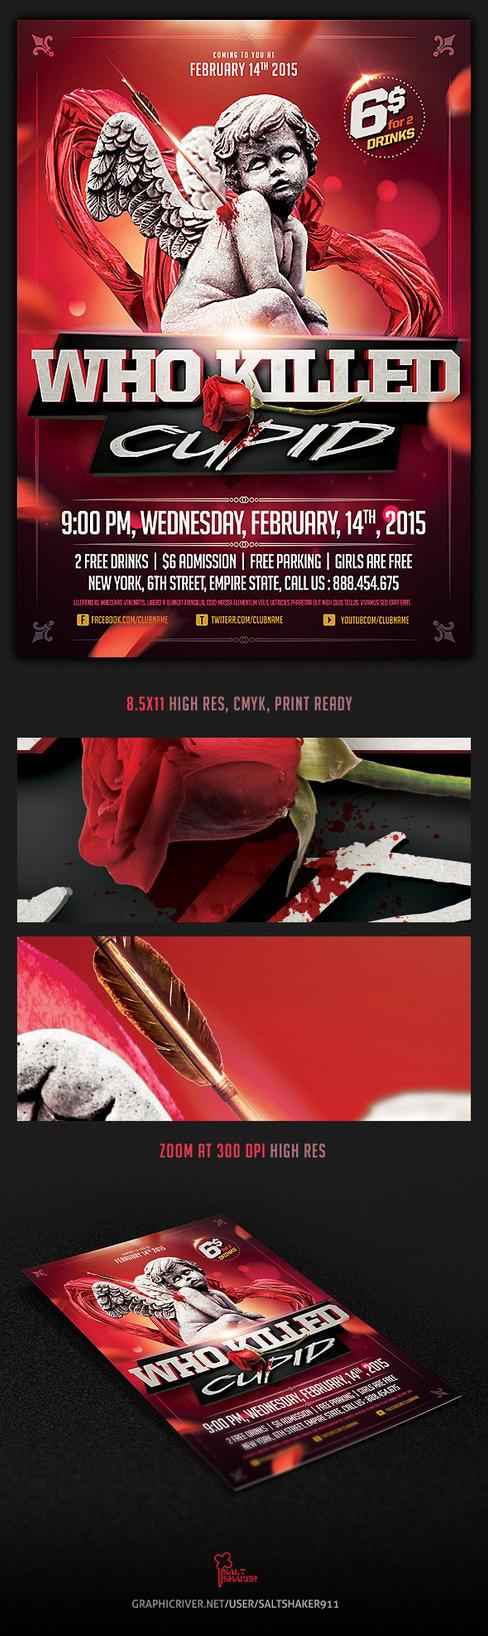 Who killed Cupid Valentines flyer by saltshaker911